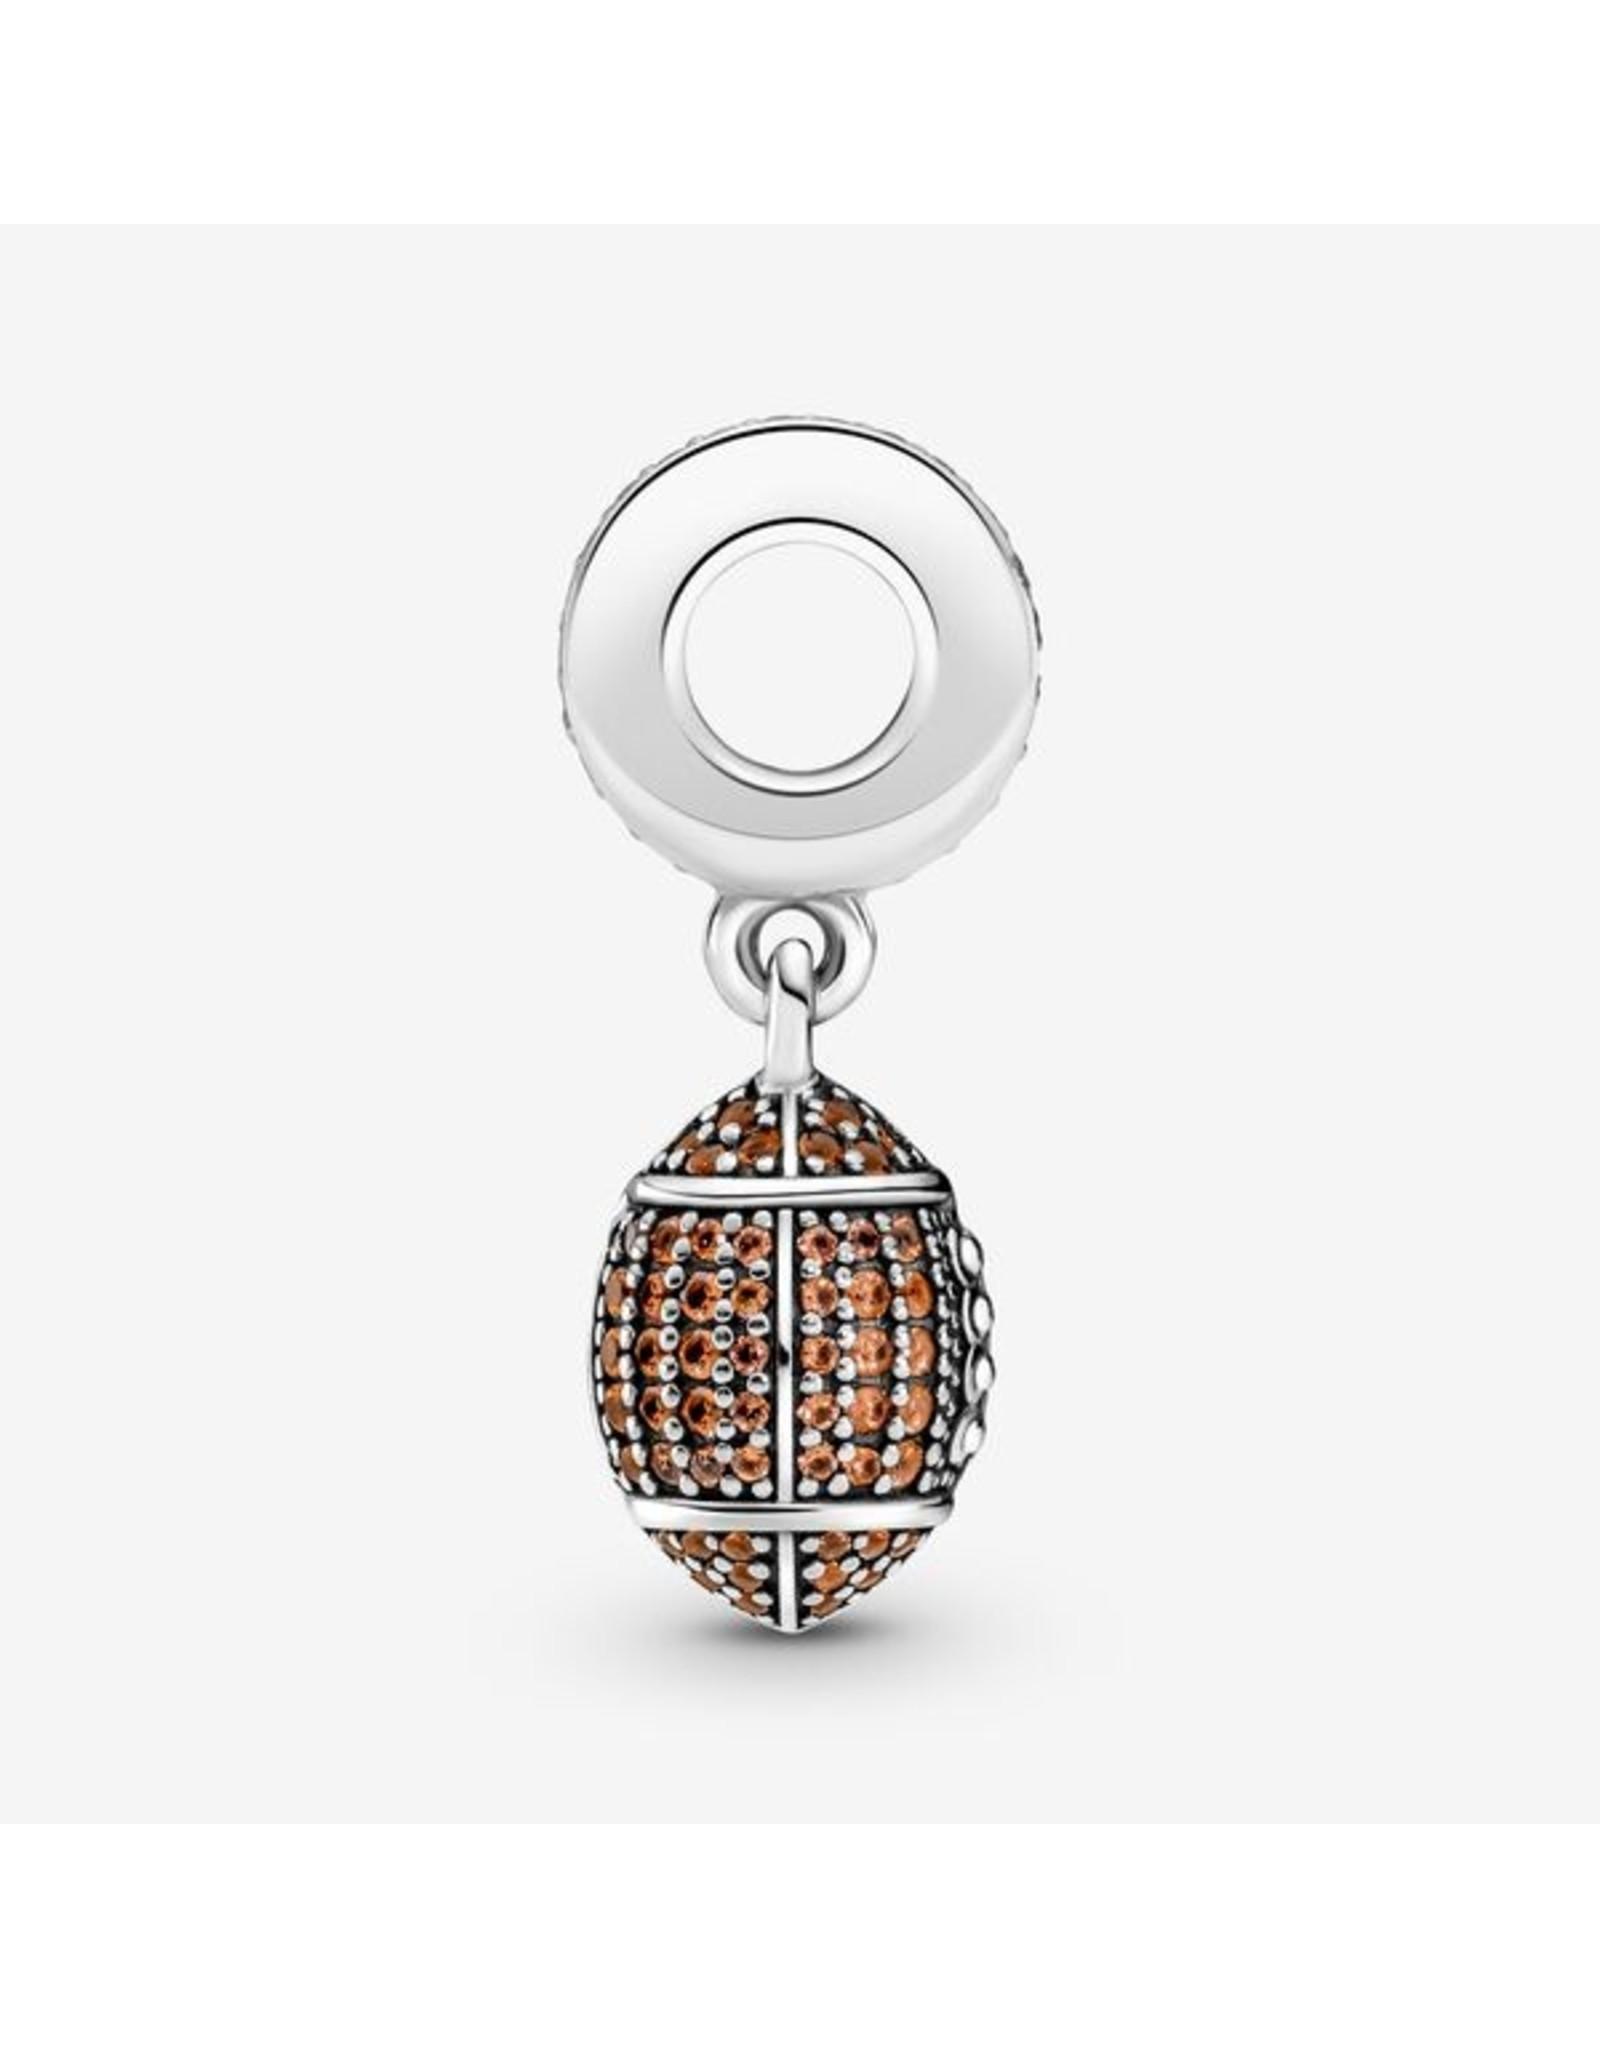 Pandora Pandora Charm, 799530C01,American Football, Sterling Silver Dangle With Clear CZ